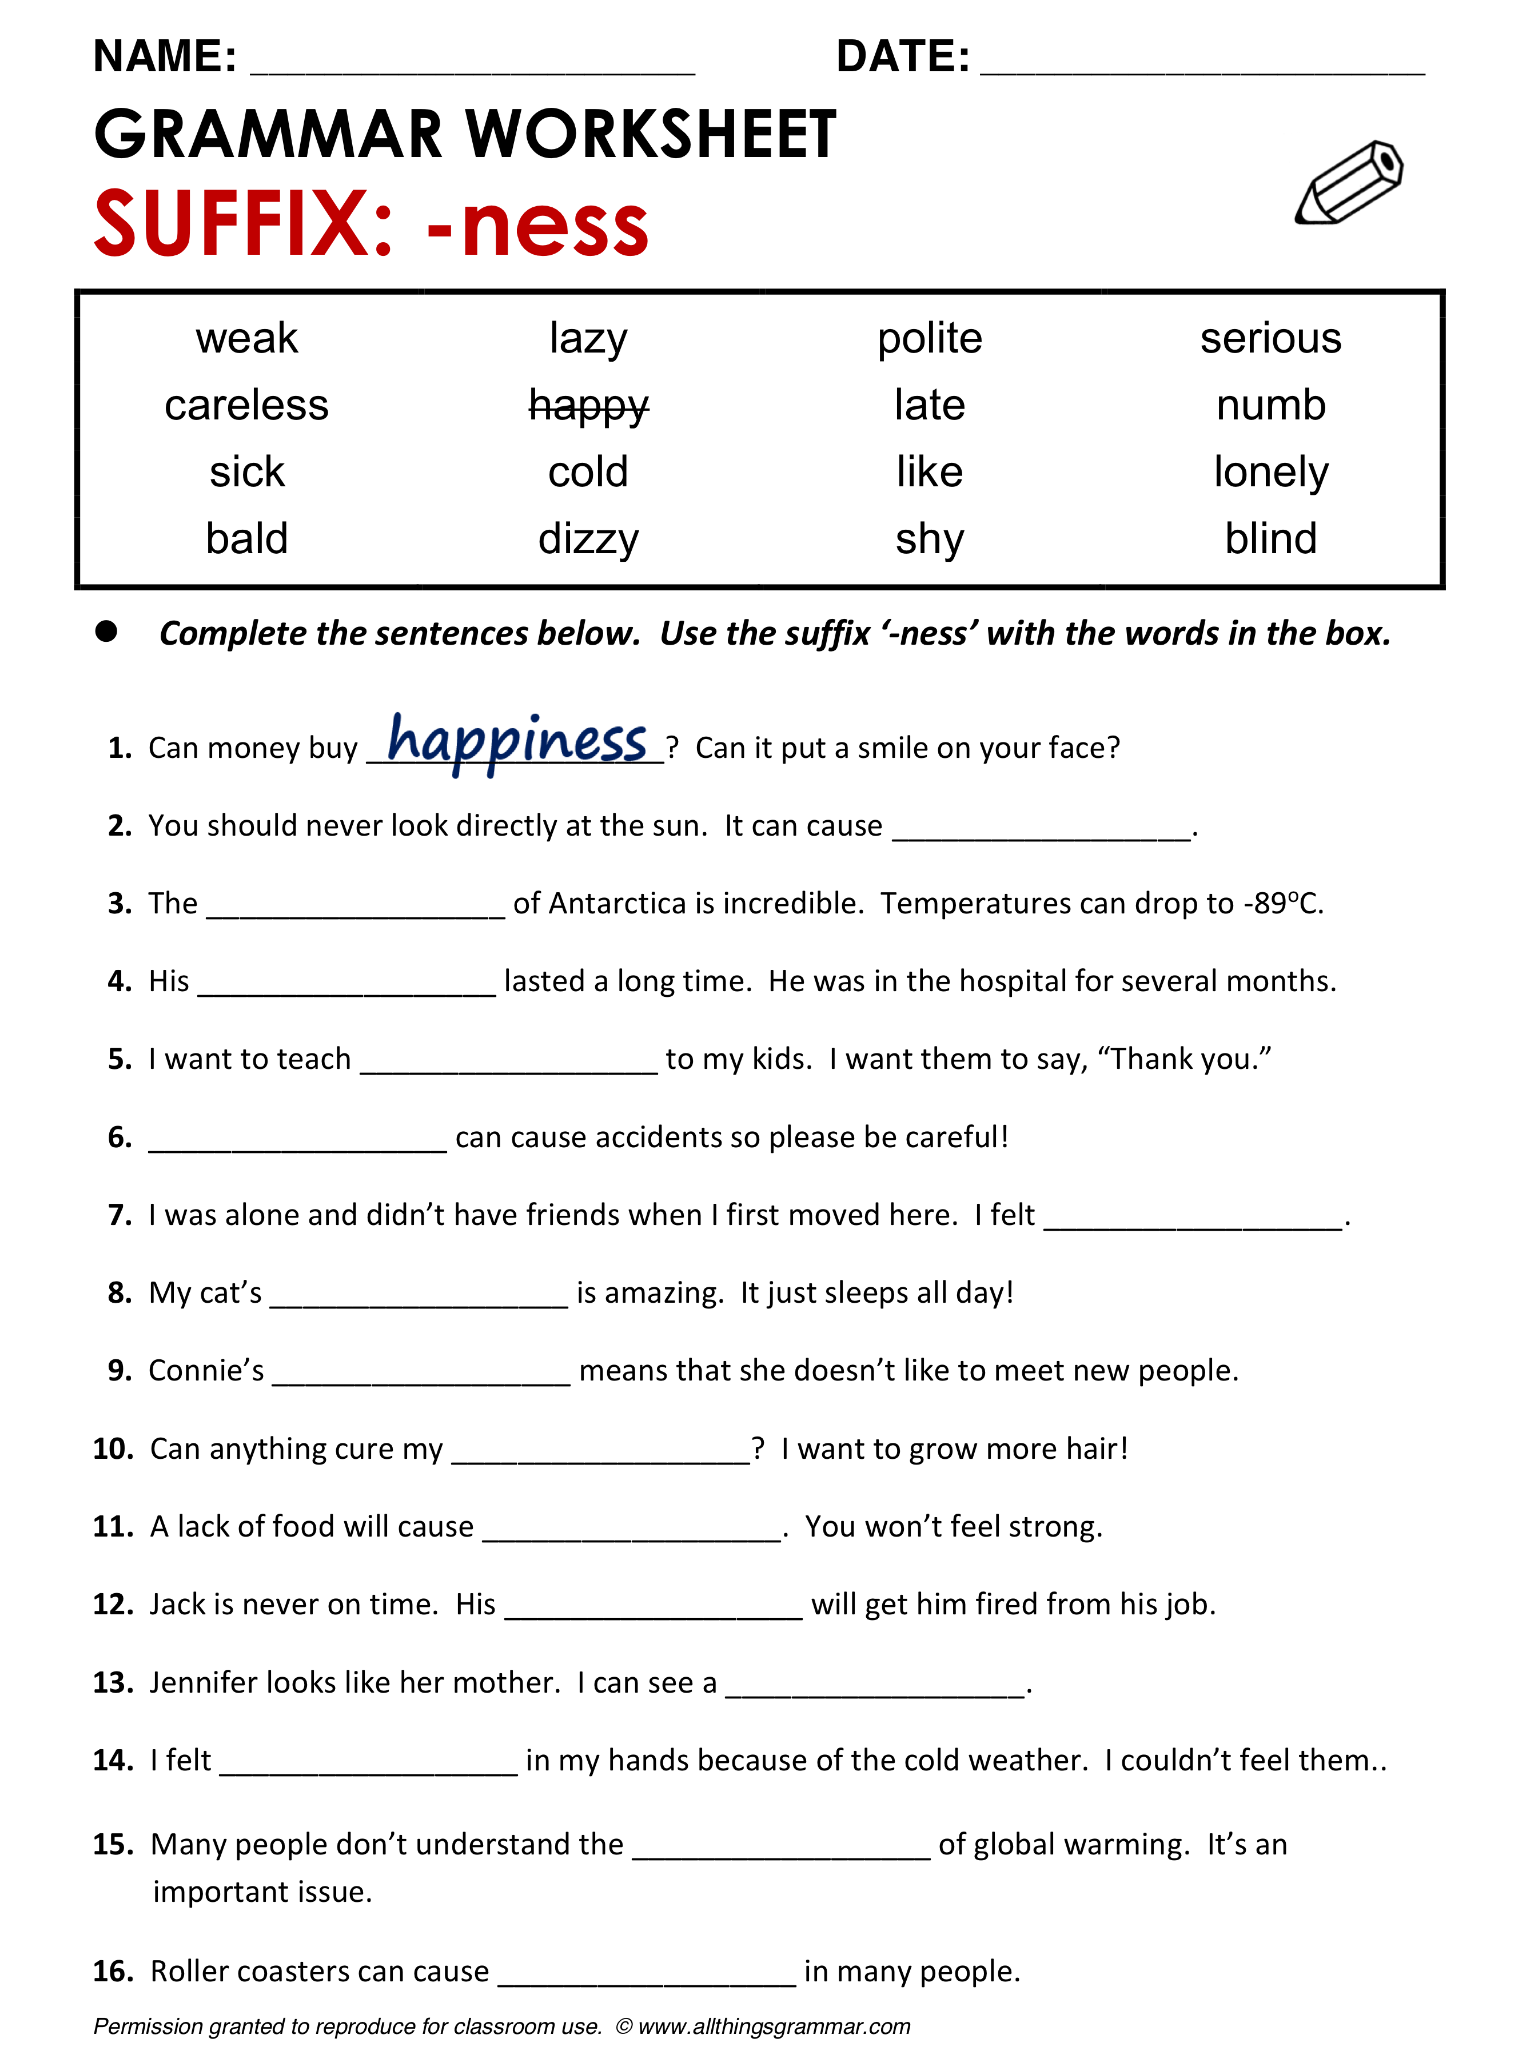 small resolution of English Grammar Suffix: -ness www.allthingsgrammar.com/suffix--ness.html    English grammar worksheets